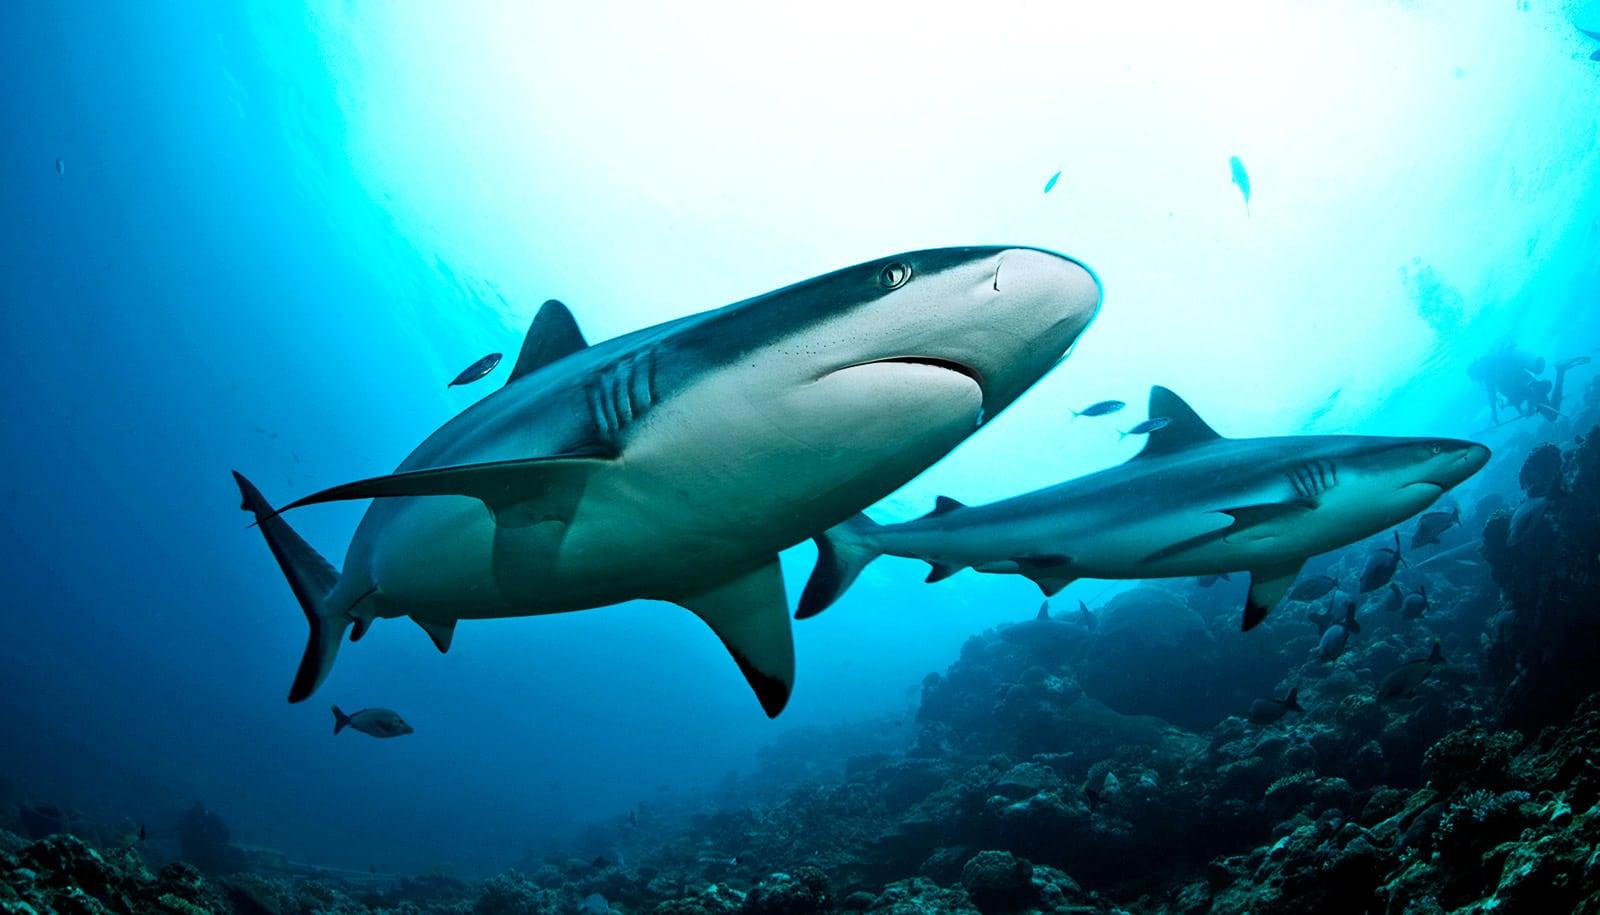 Satellites in orbit can save sharks in the ocean